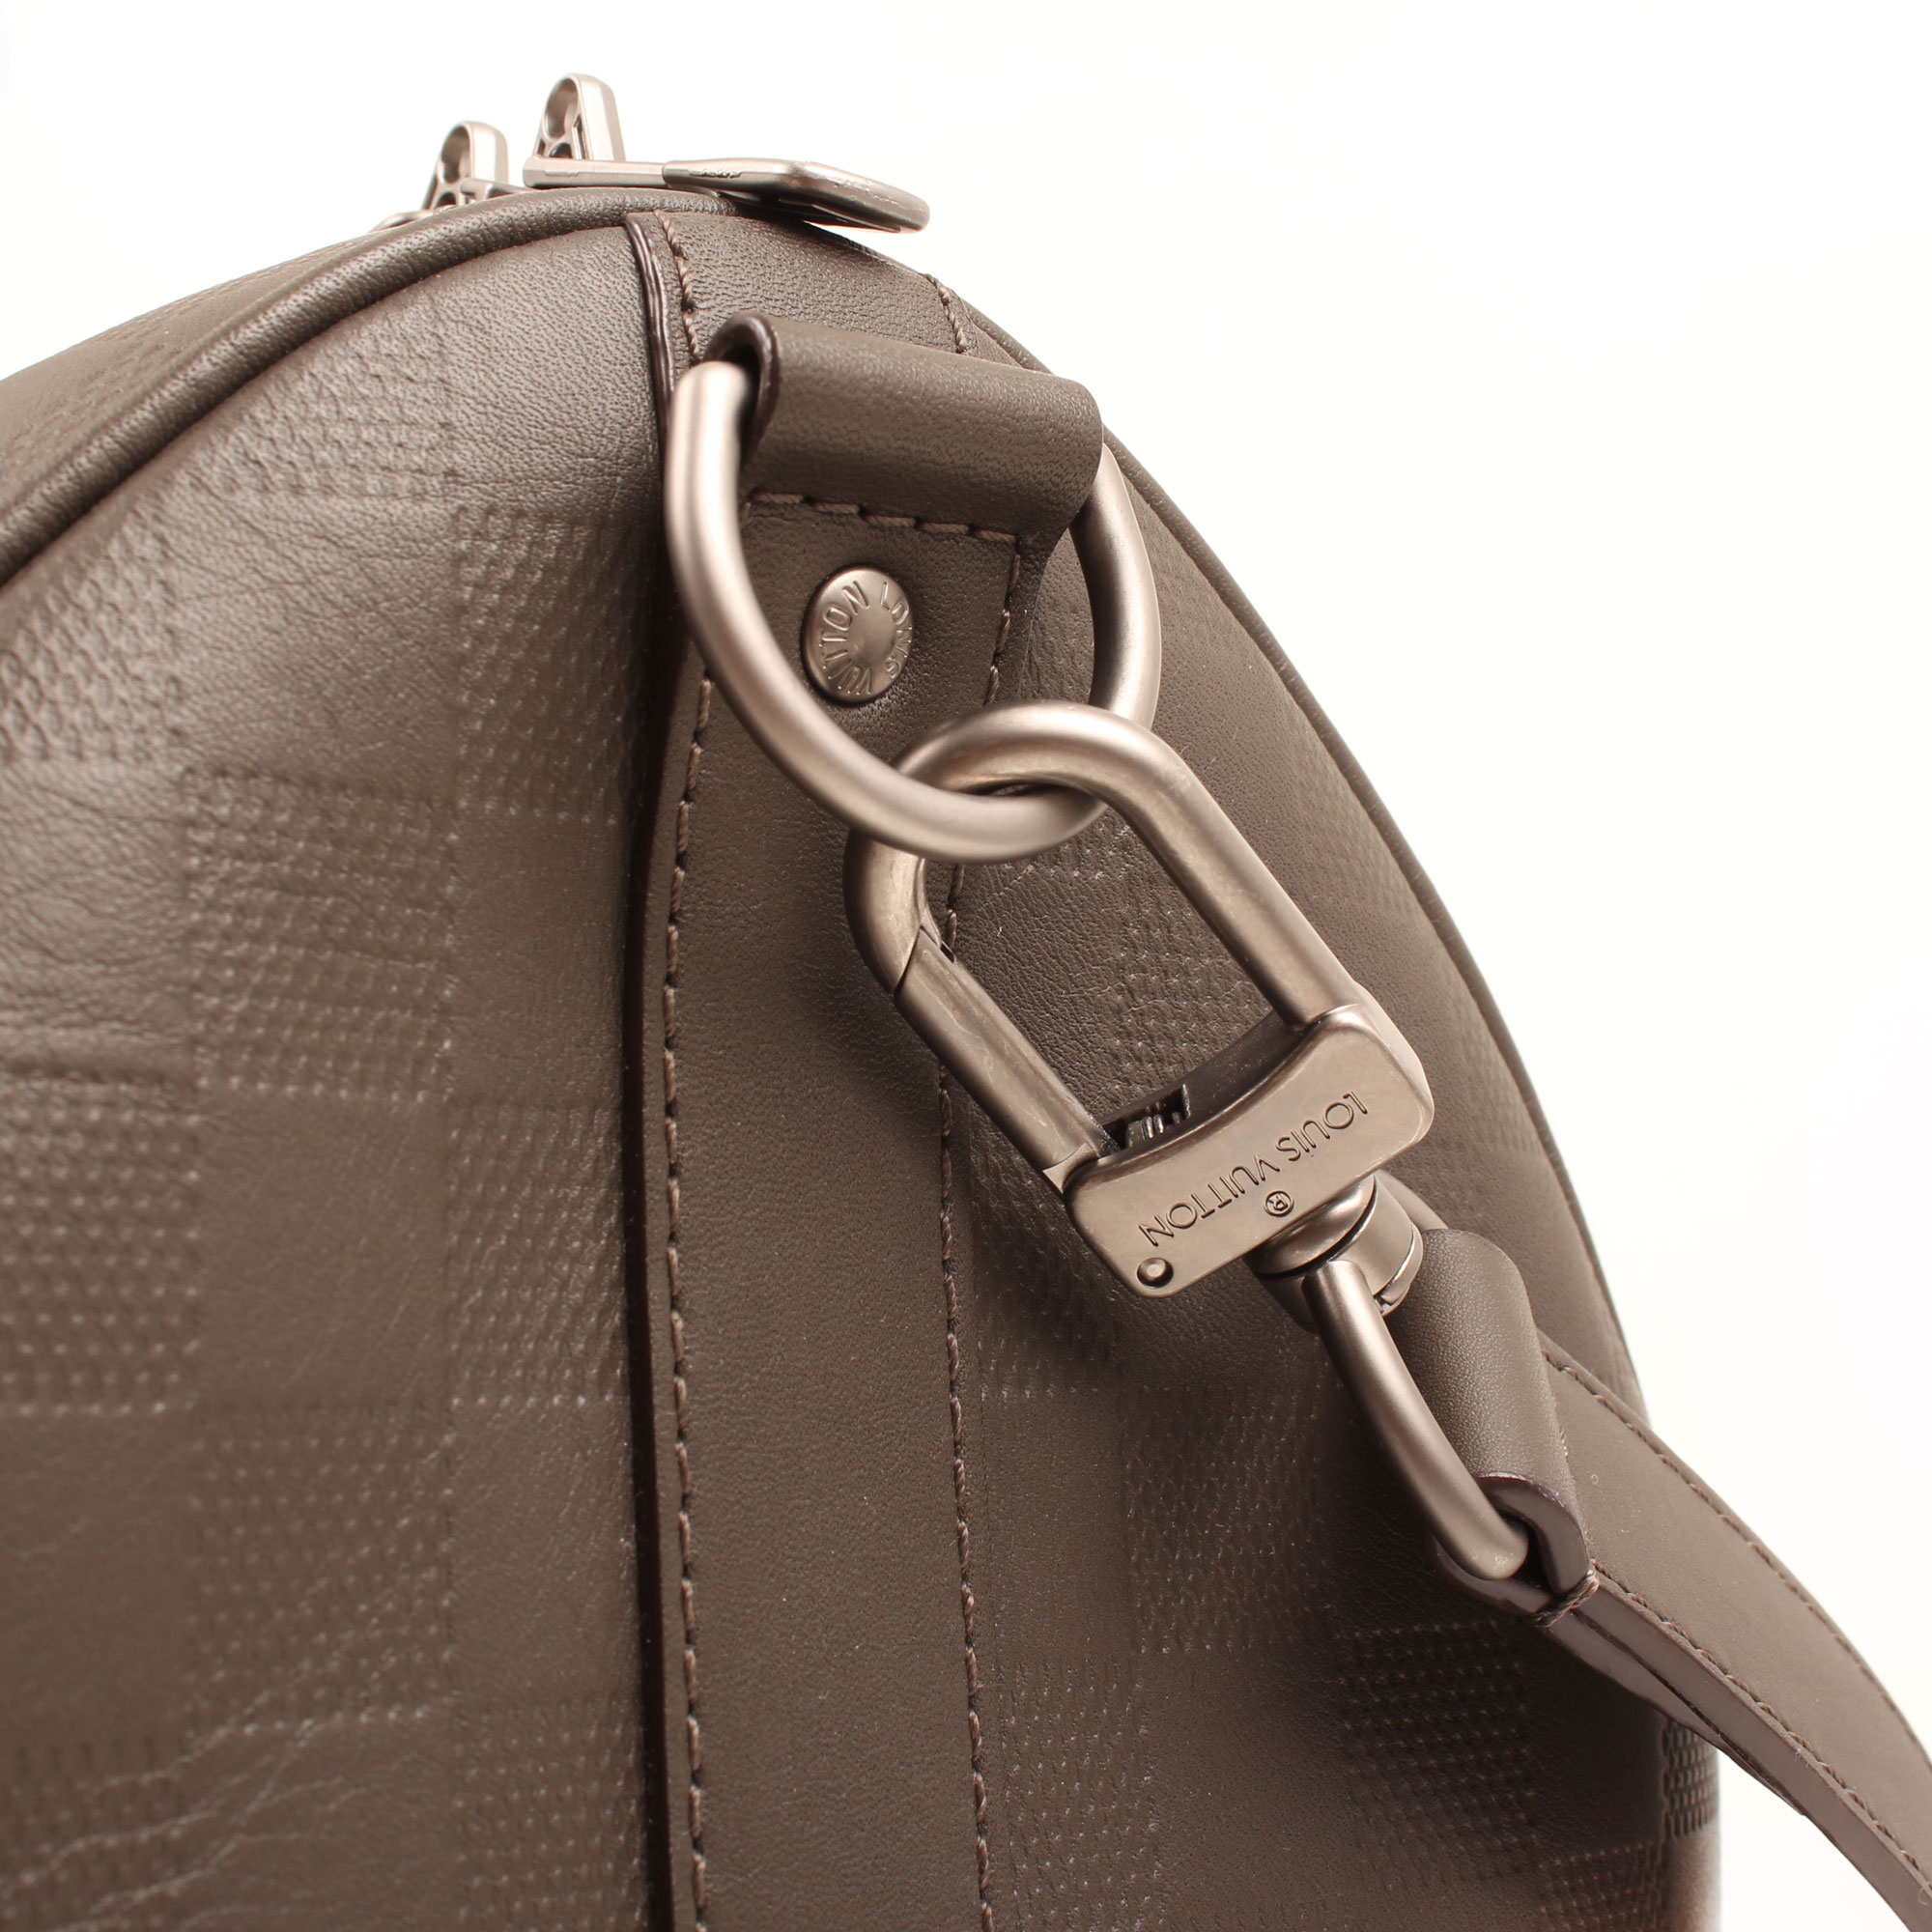 Imagen del detalle del herraje de la bolsa louis vuitton keepall 45 damier infini detalle general